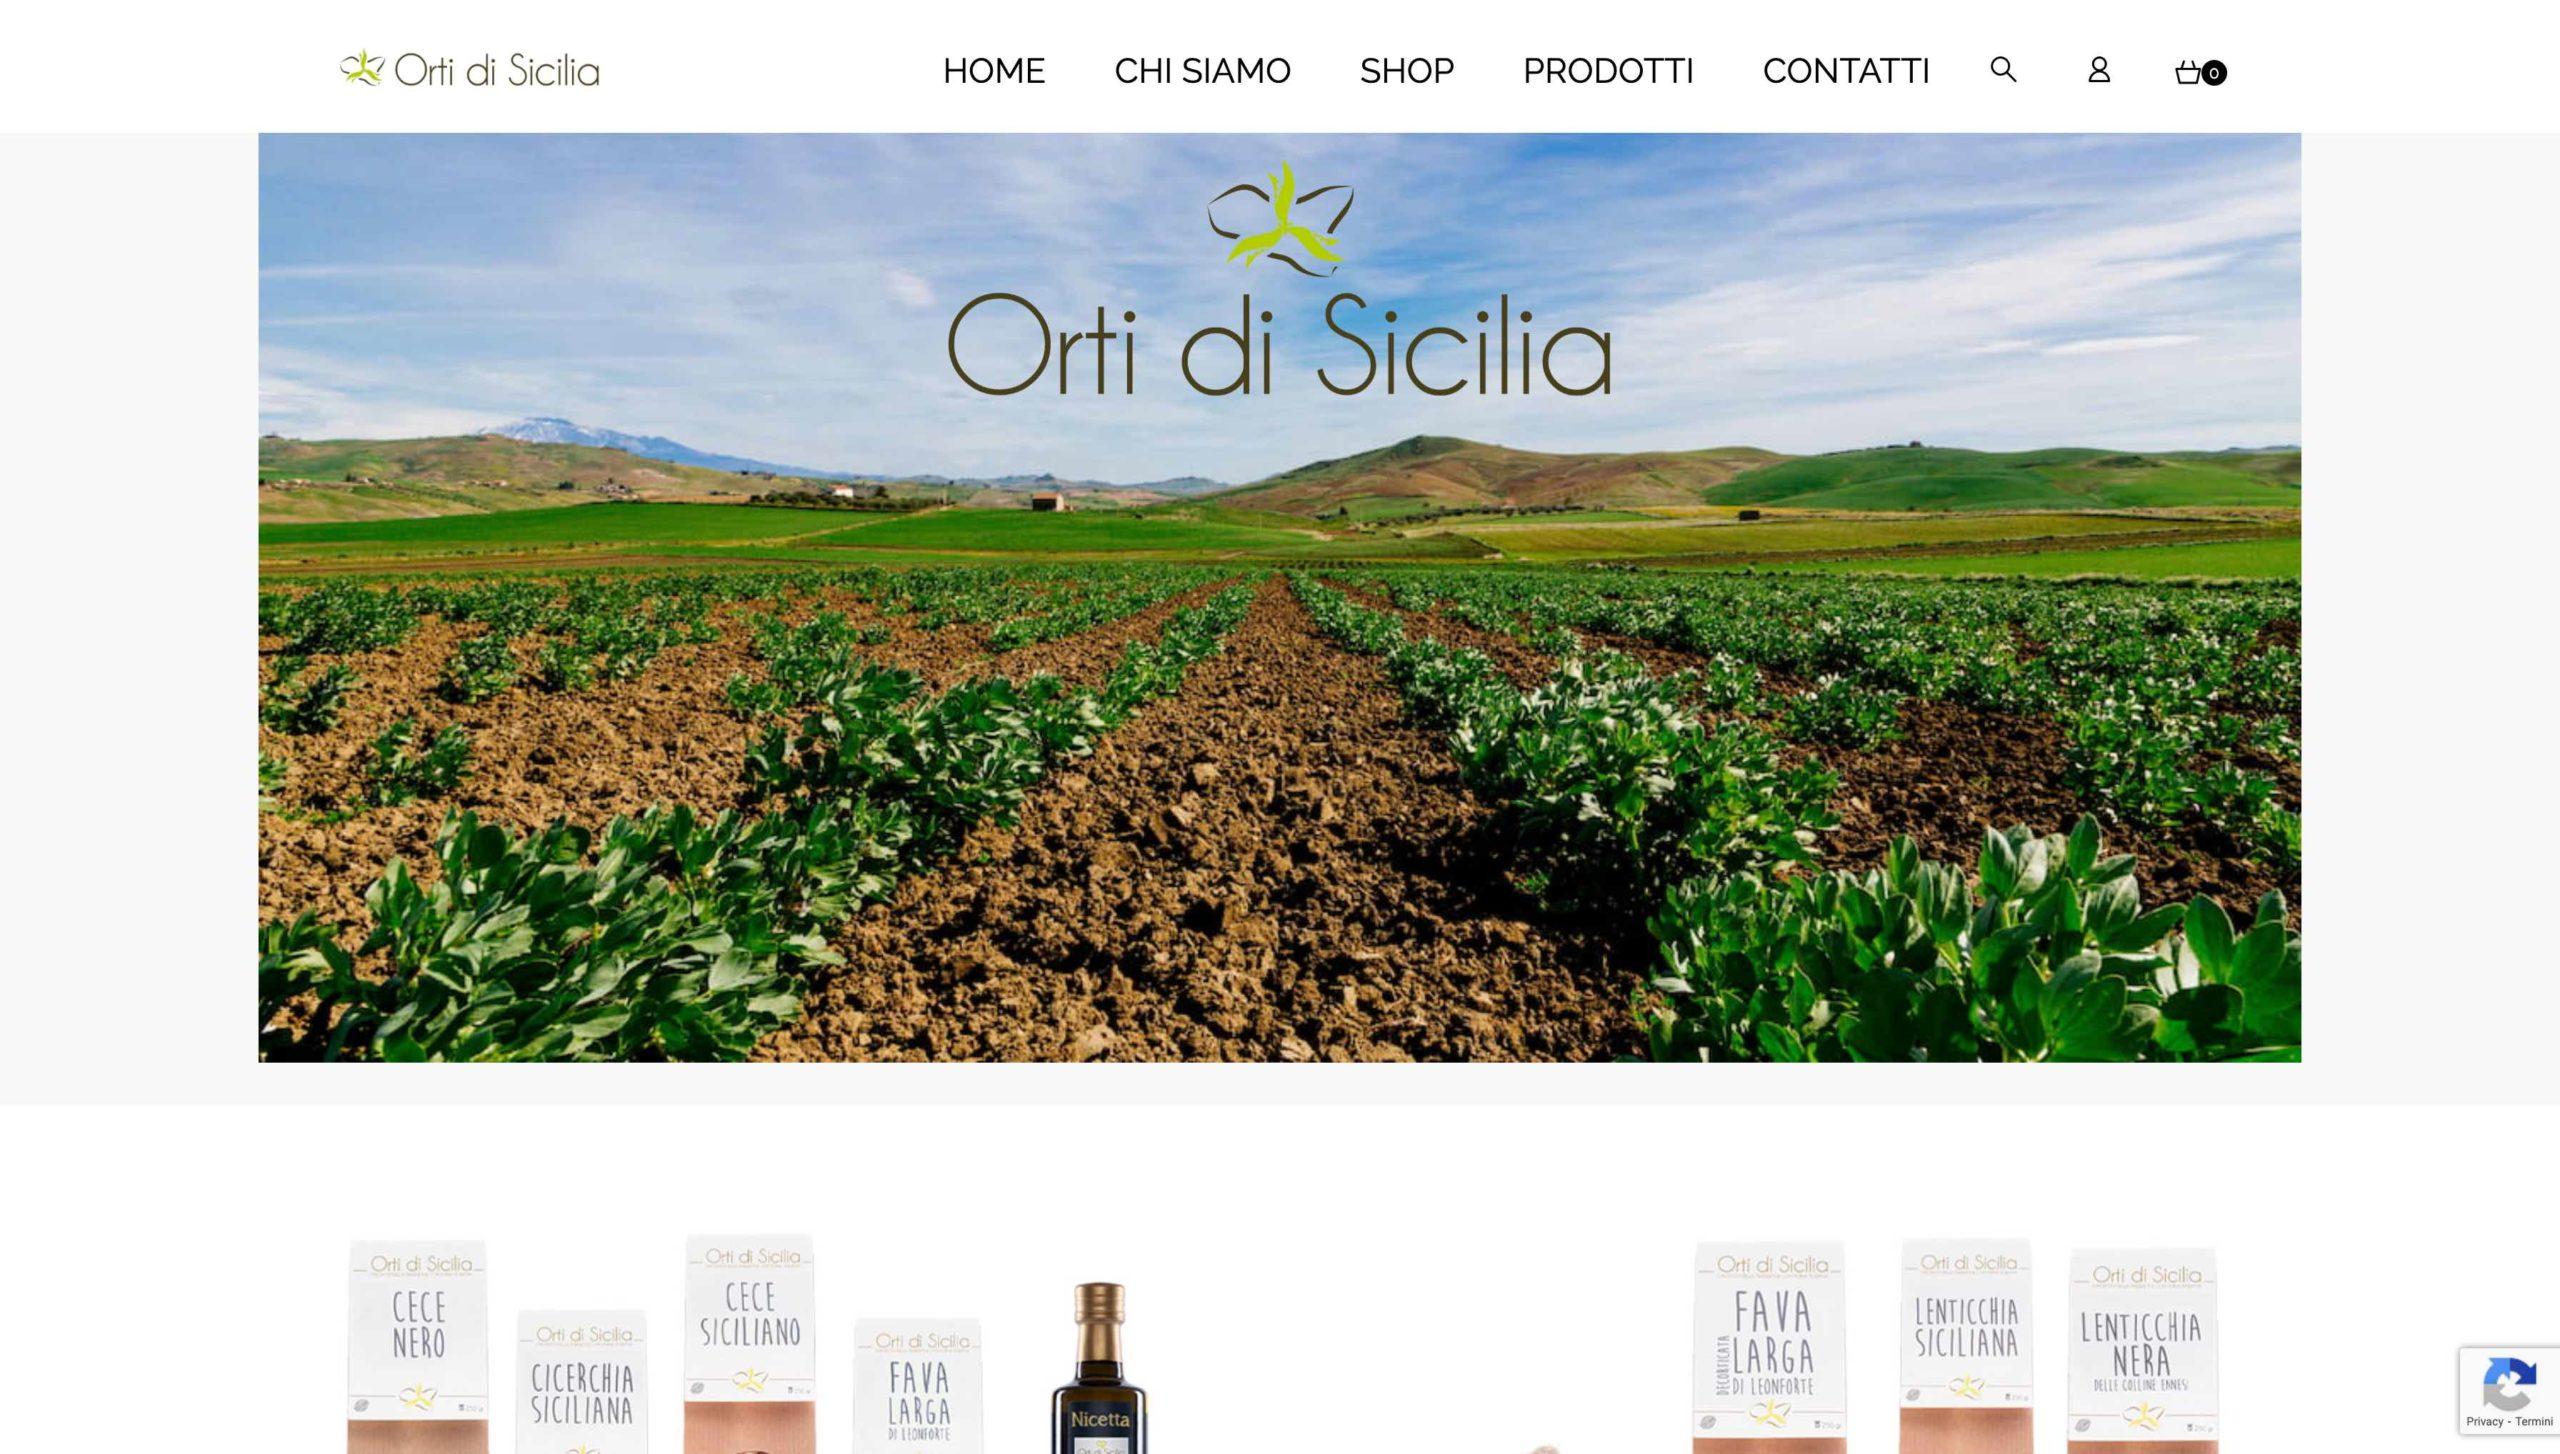 OrtiDiSicilia.it